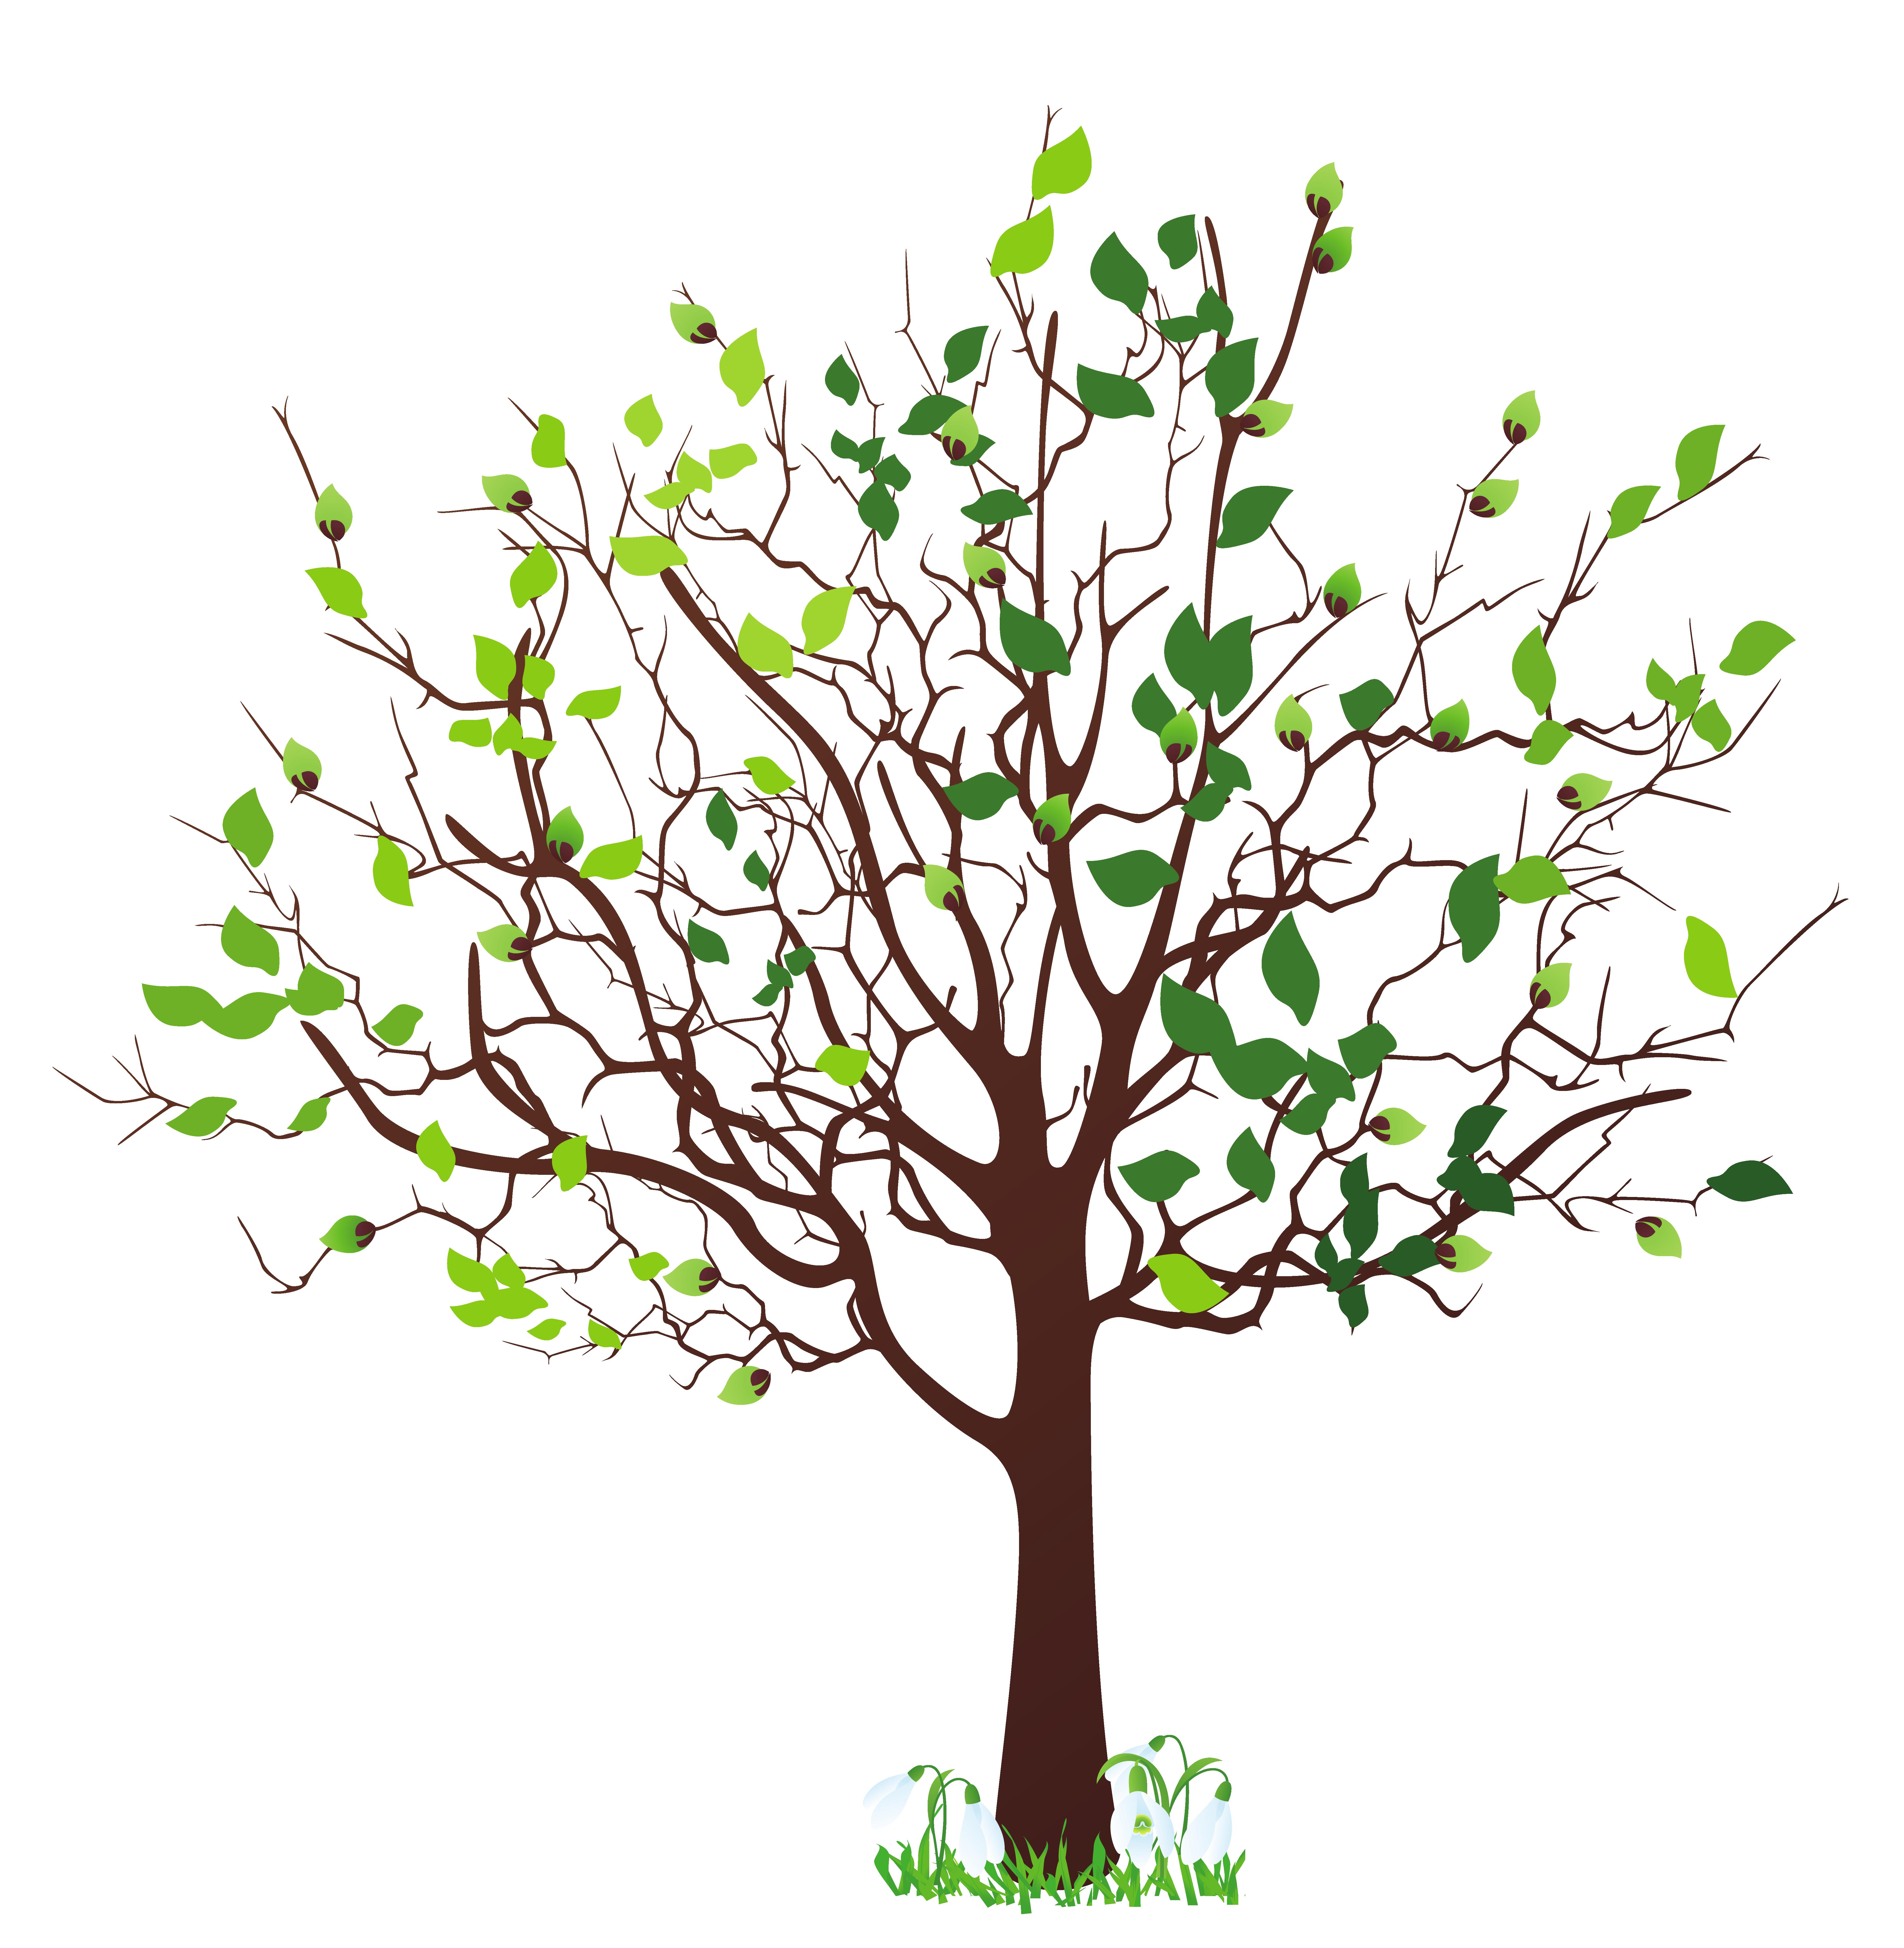 Tree Free Clipart Tree Free .-Tree Free Clipart Tree Free .-16